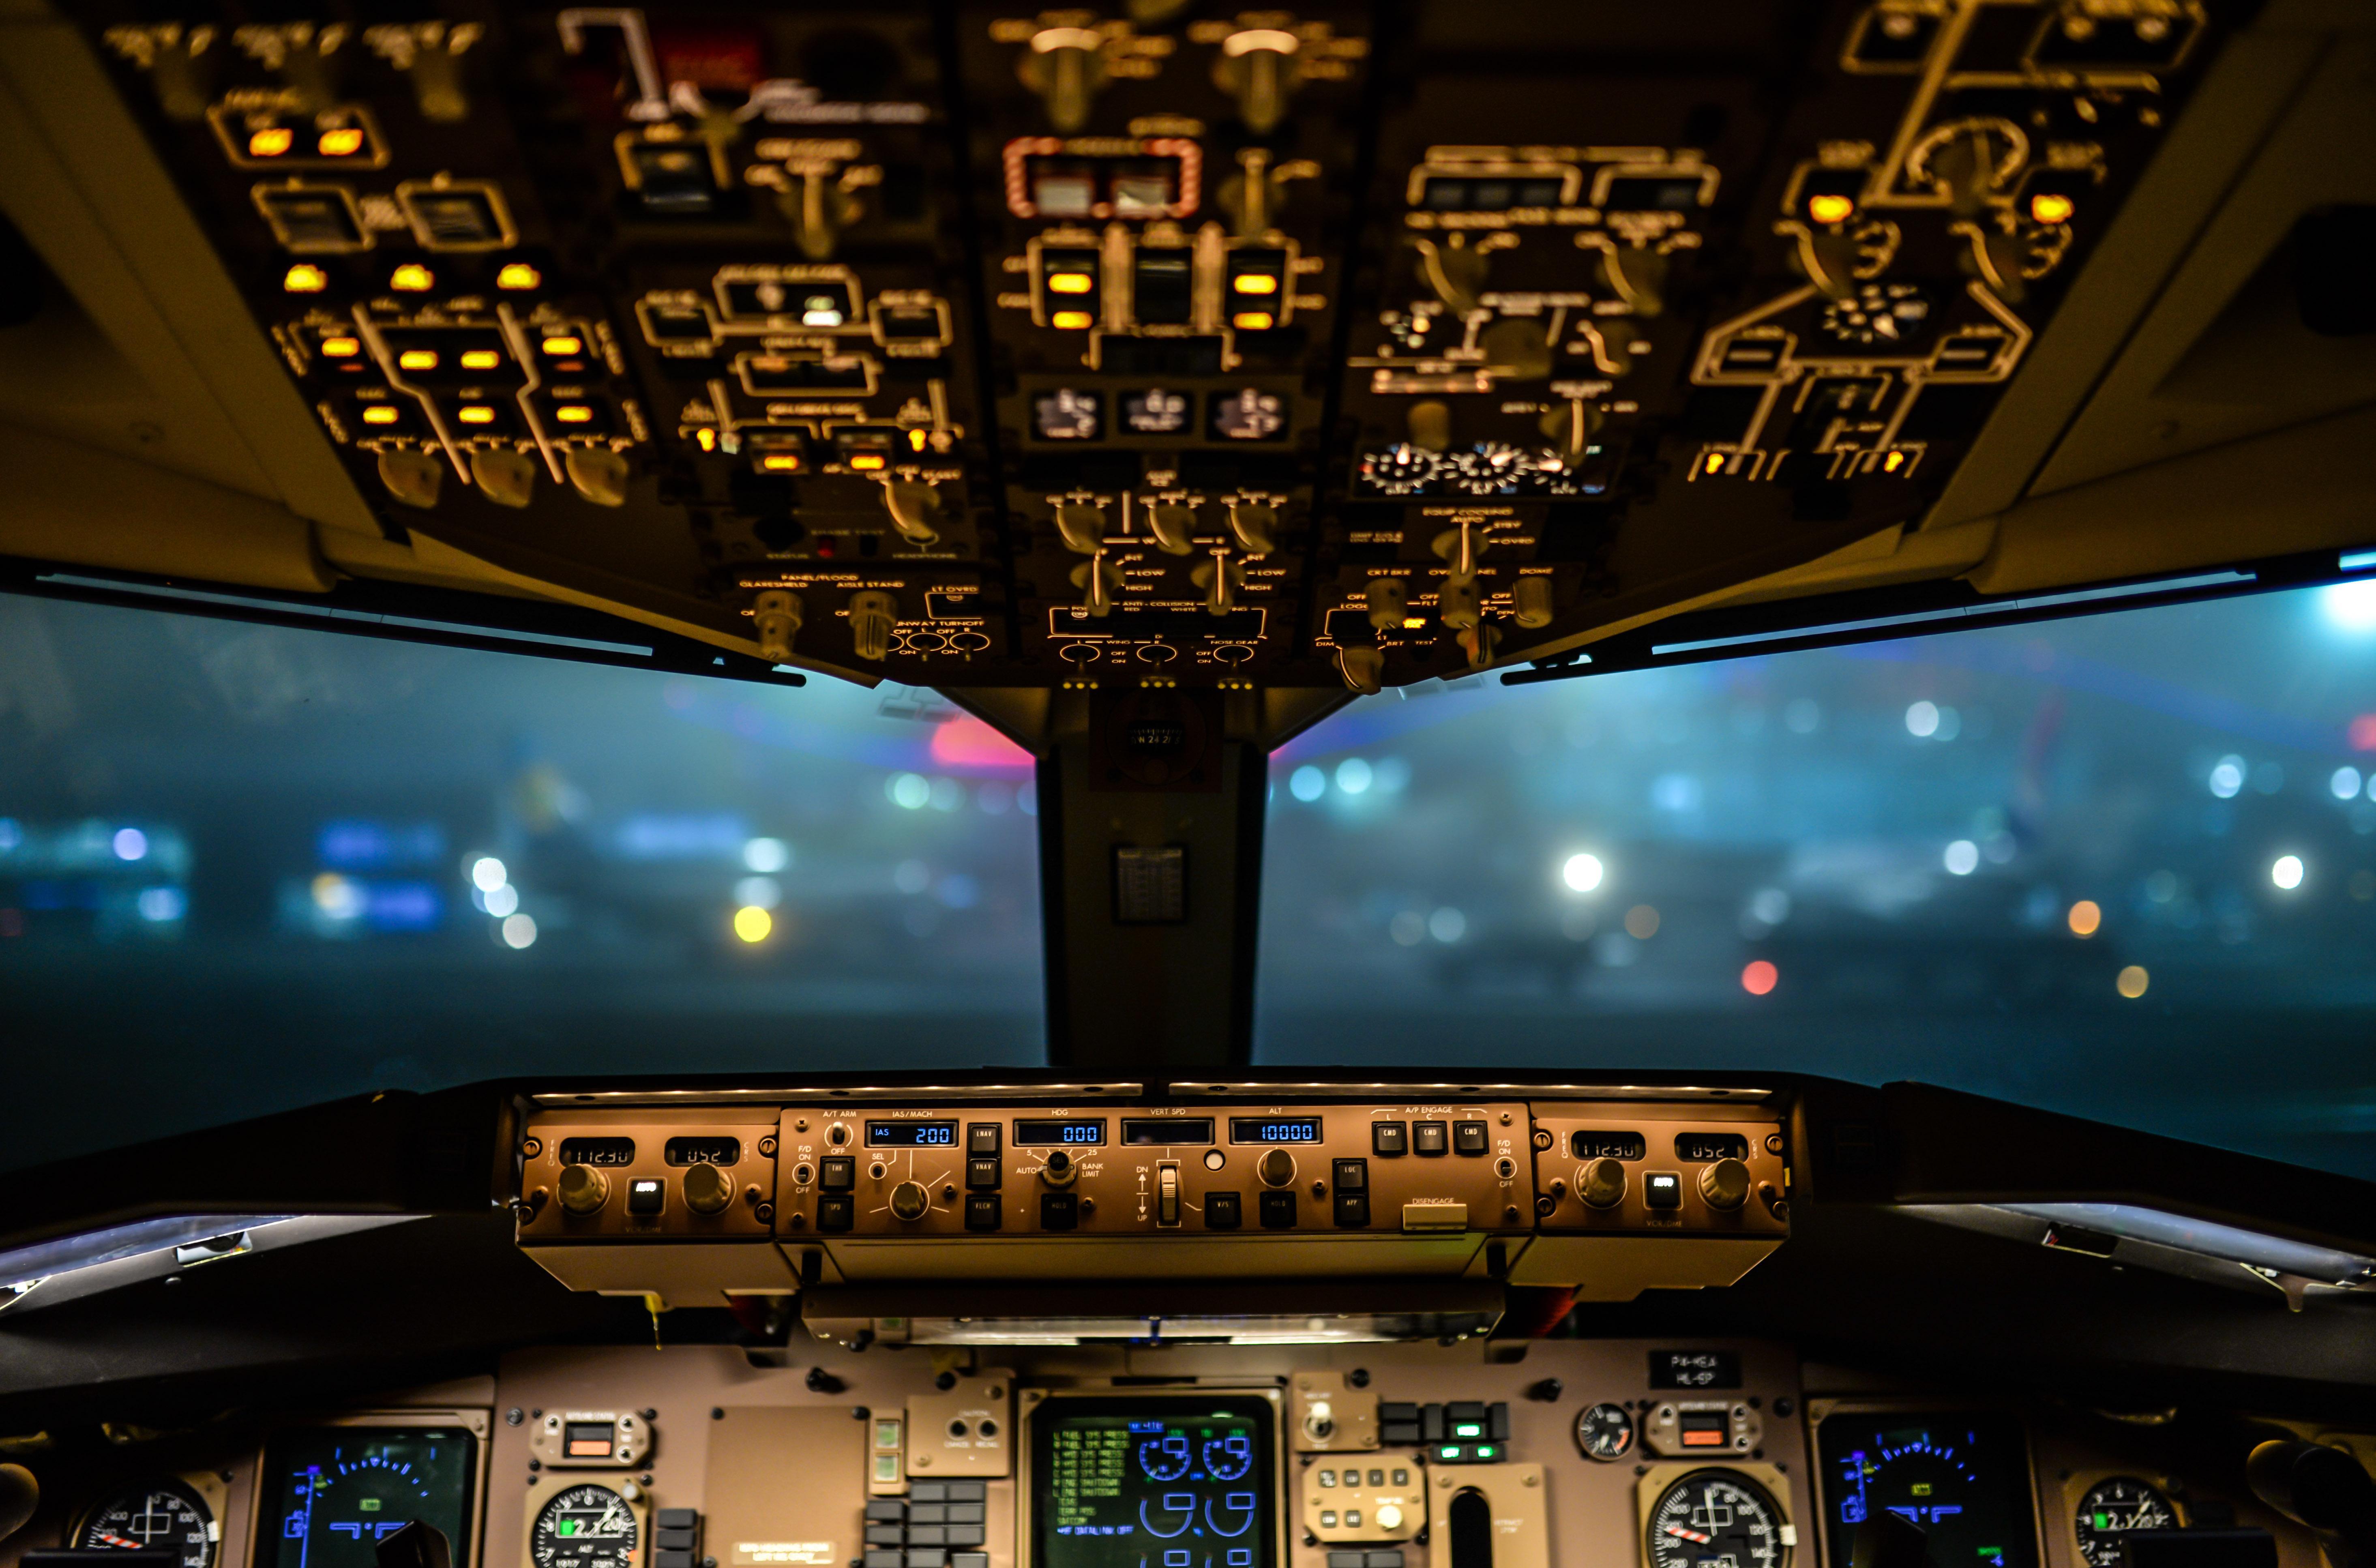 Mujer al timón: para poder pilotar creó su aerolínea